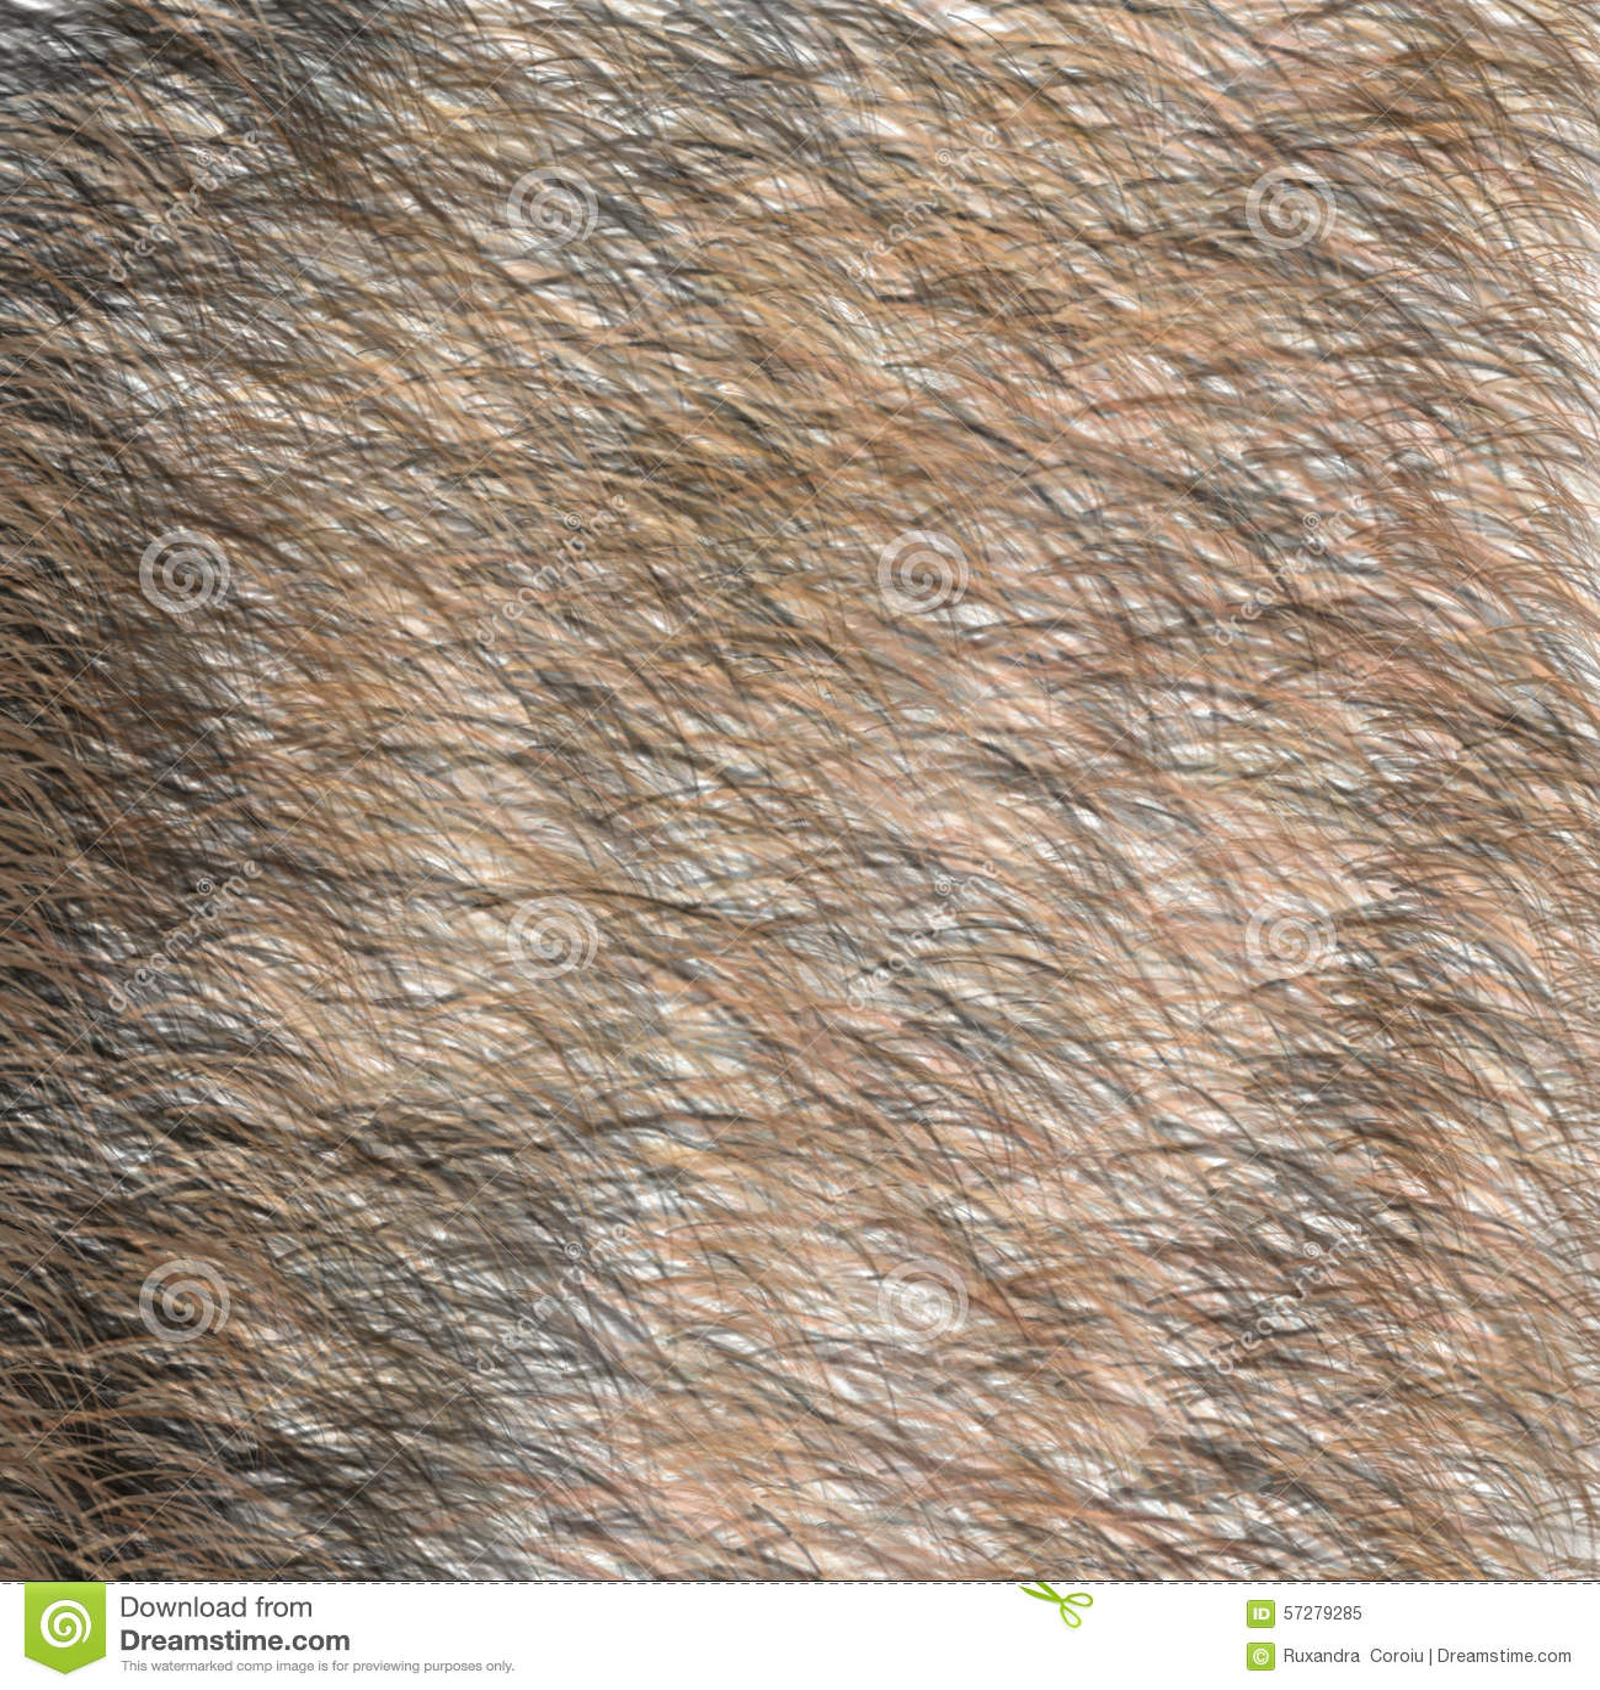 Miraculous Animal Brown And Black Fur Texture Short Hair Stock Illustration Short Hairstyles For Black Women Fulllsitofus